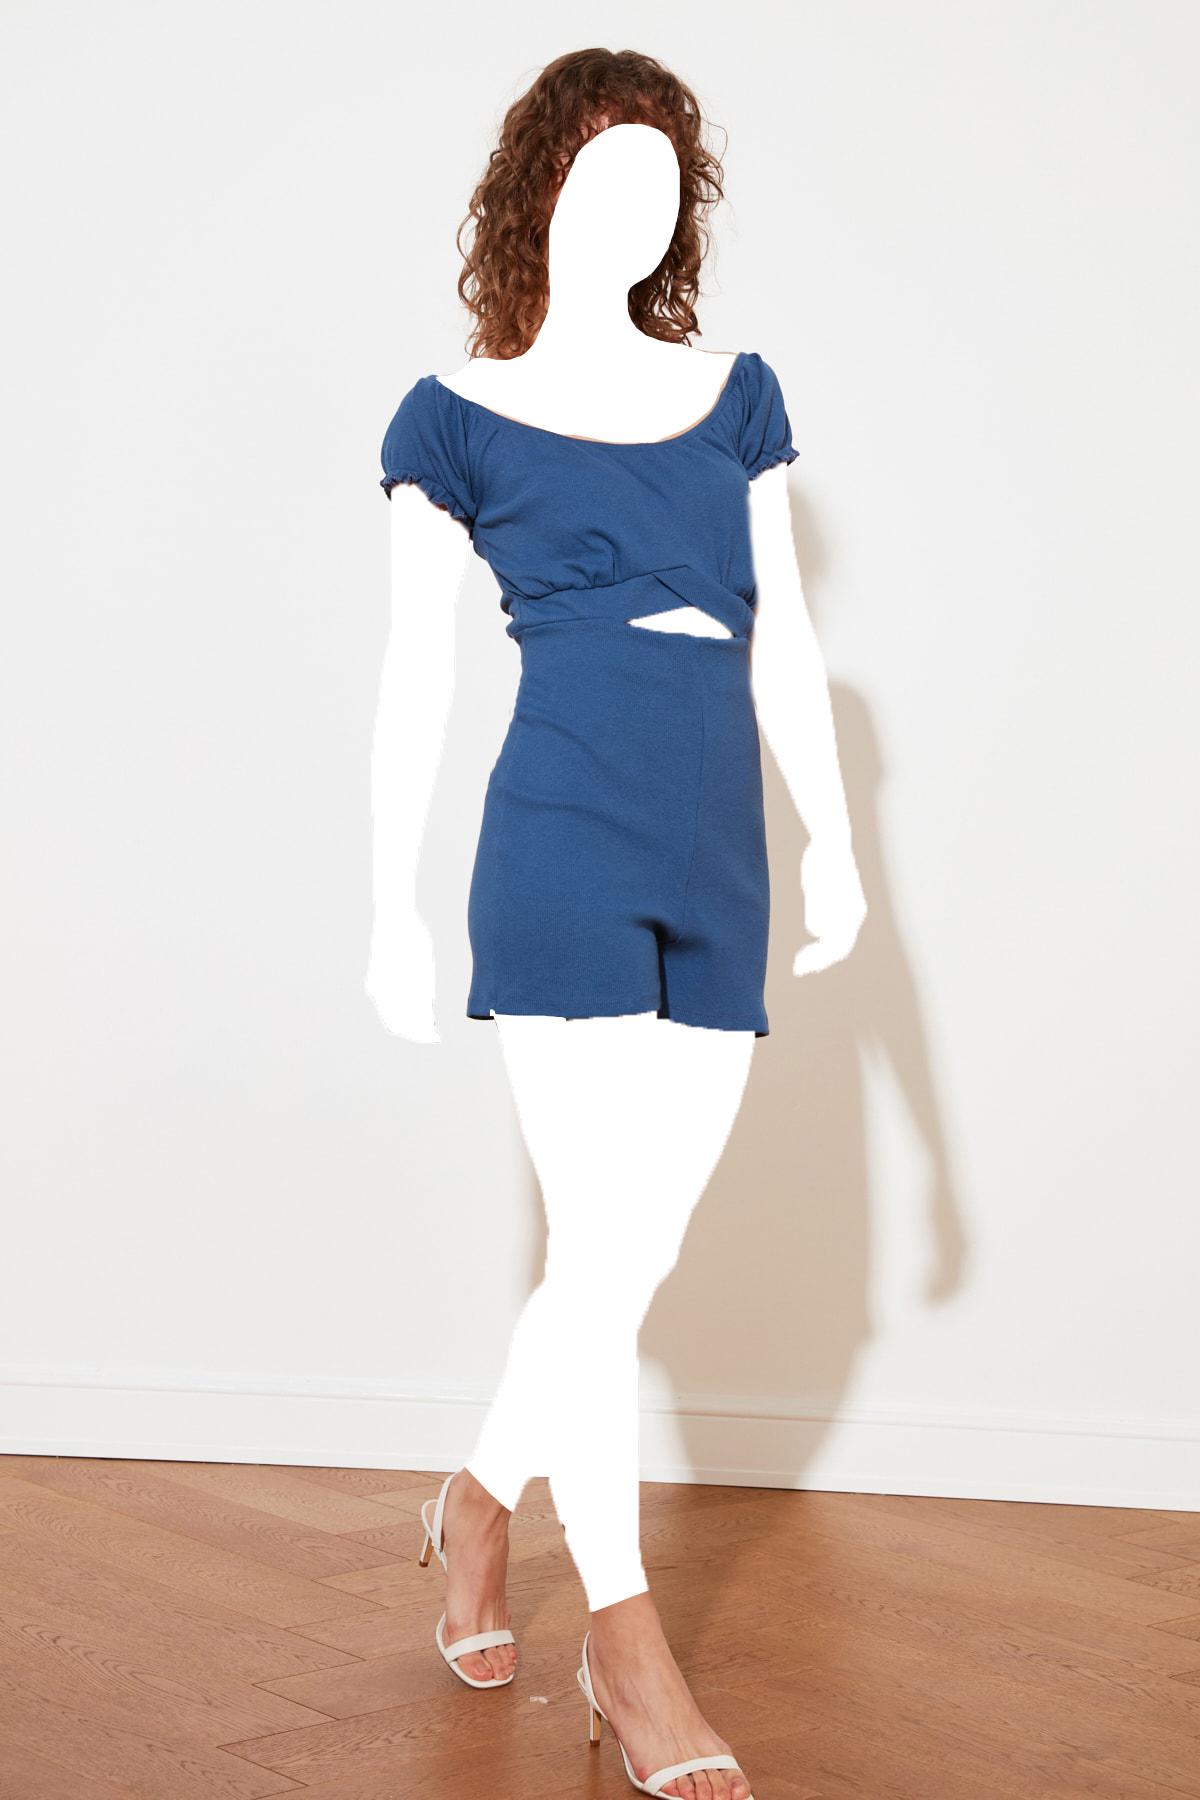 خرید تولوم 2020 زنانه برند ترندیول میلا ترک رنگ آبی کد ty88589879